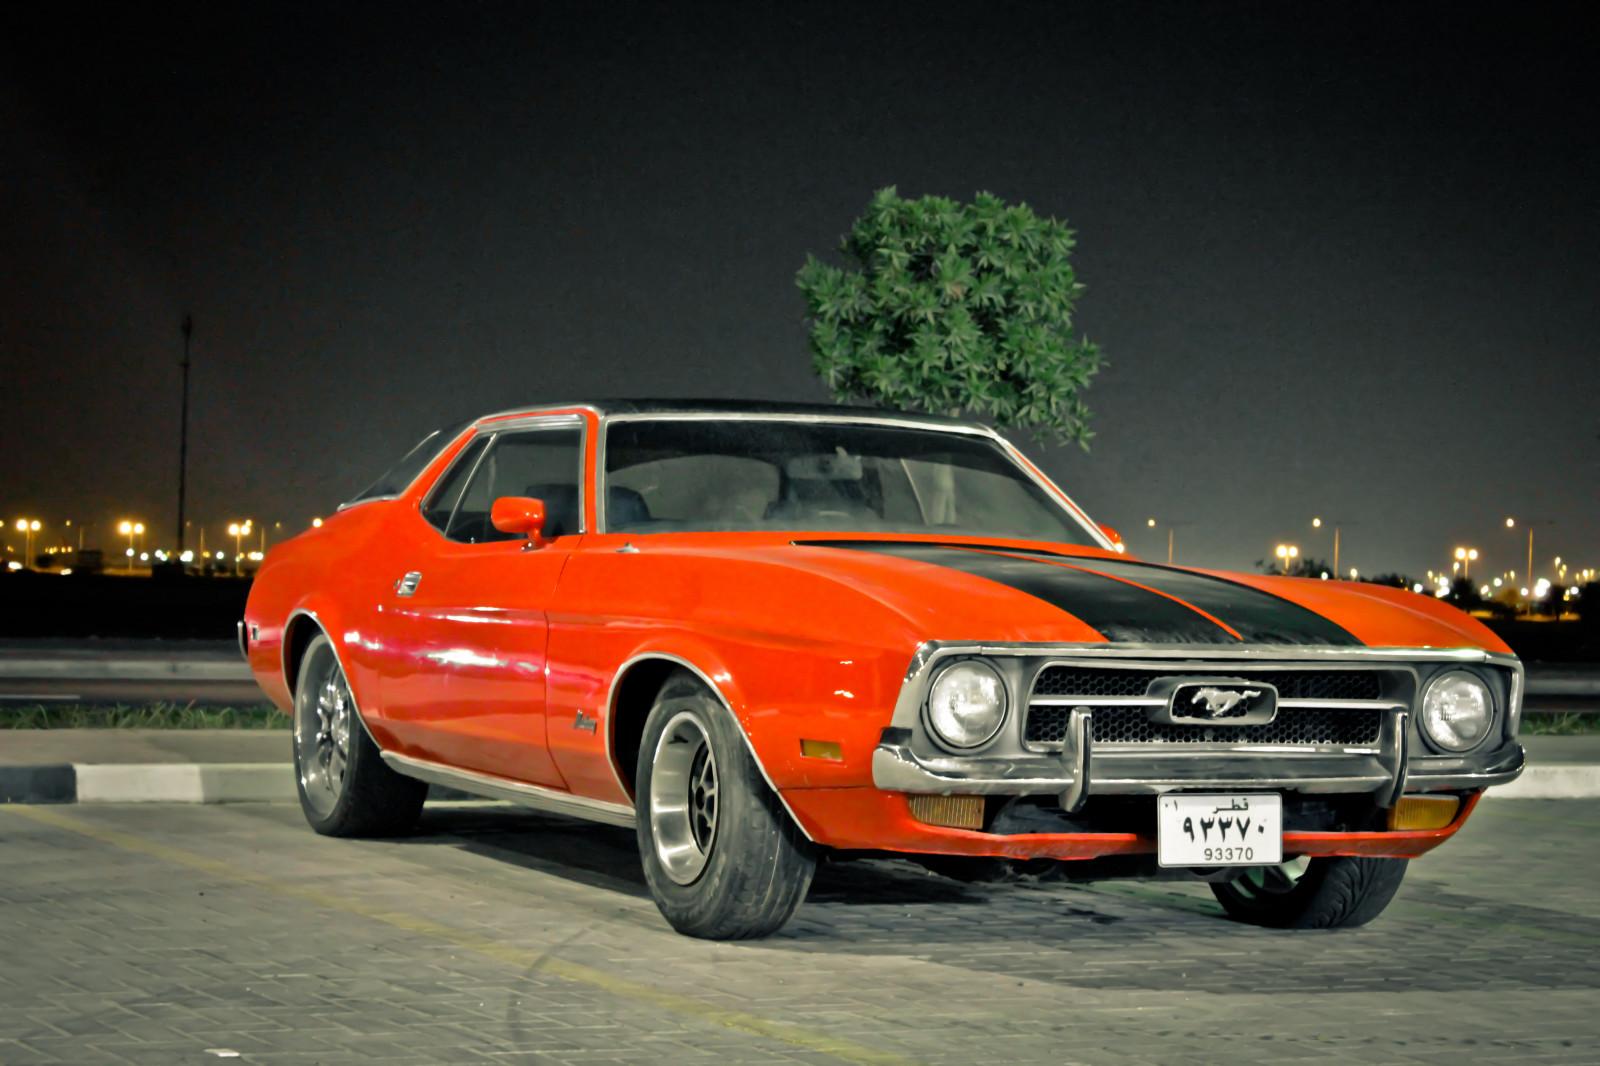 Wallpaper : old, sports car, classic car, Chevy, Qatar, Doha, Ford ...